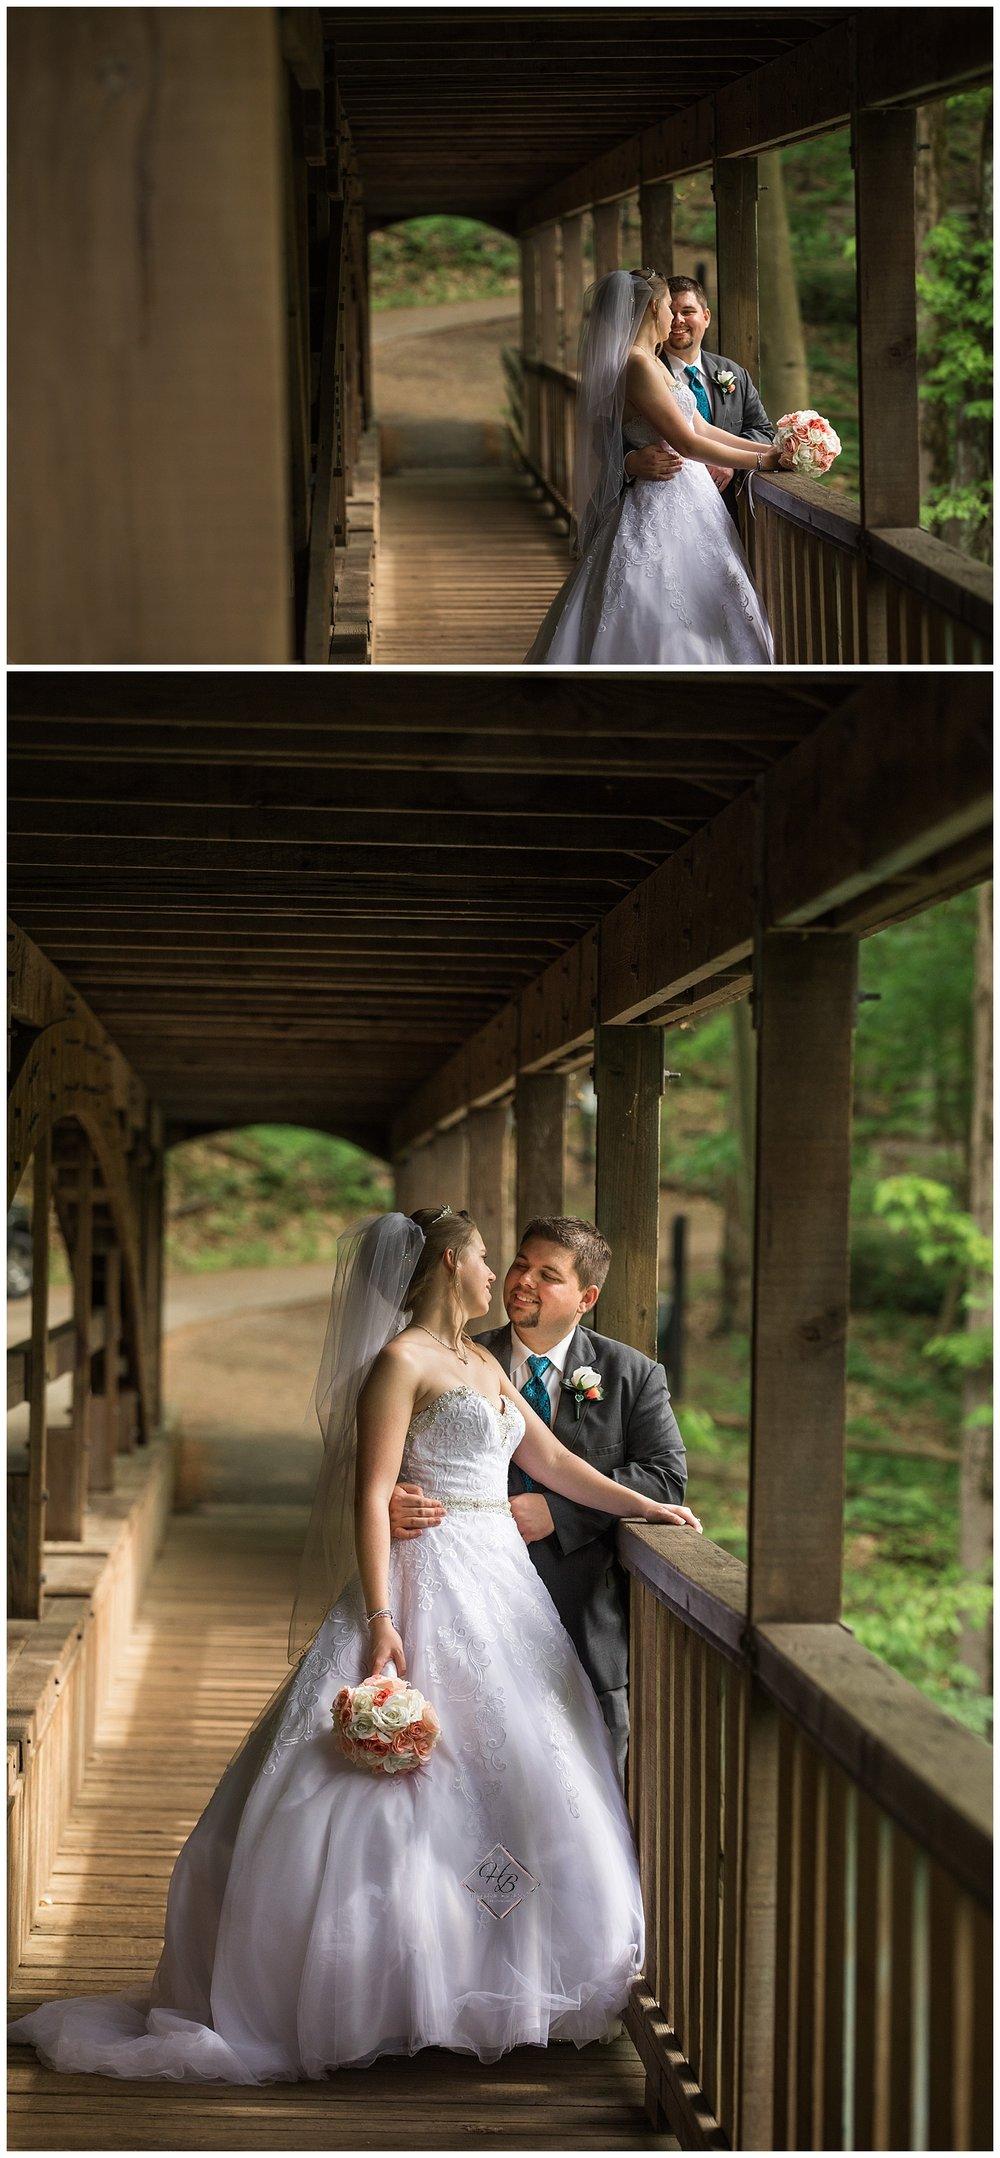 Youngstown, OH Fairytale Wedding Lanterman's Mill Bride Groom Photos